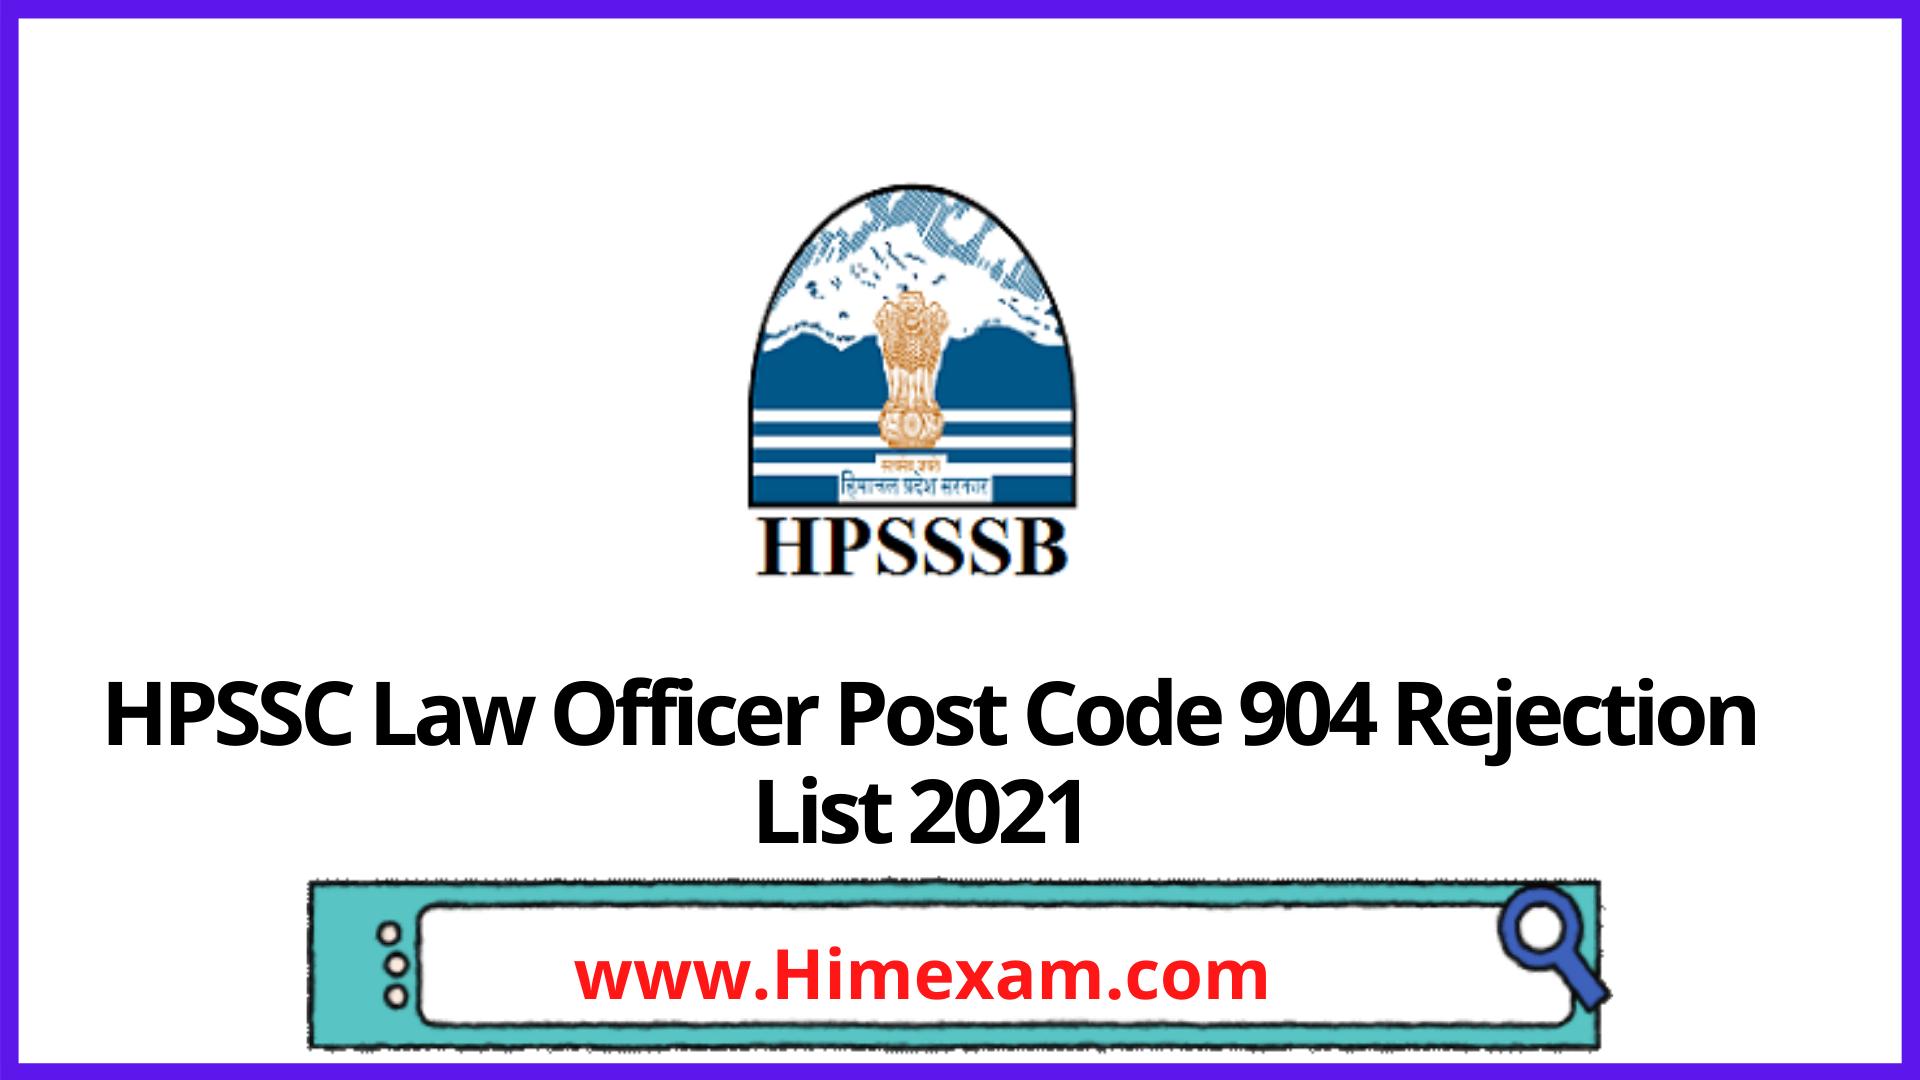 HPSSC Law Officer Post Code 904 Rejection List 2021